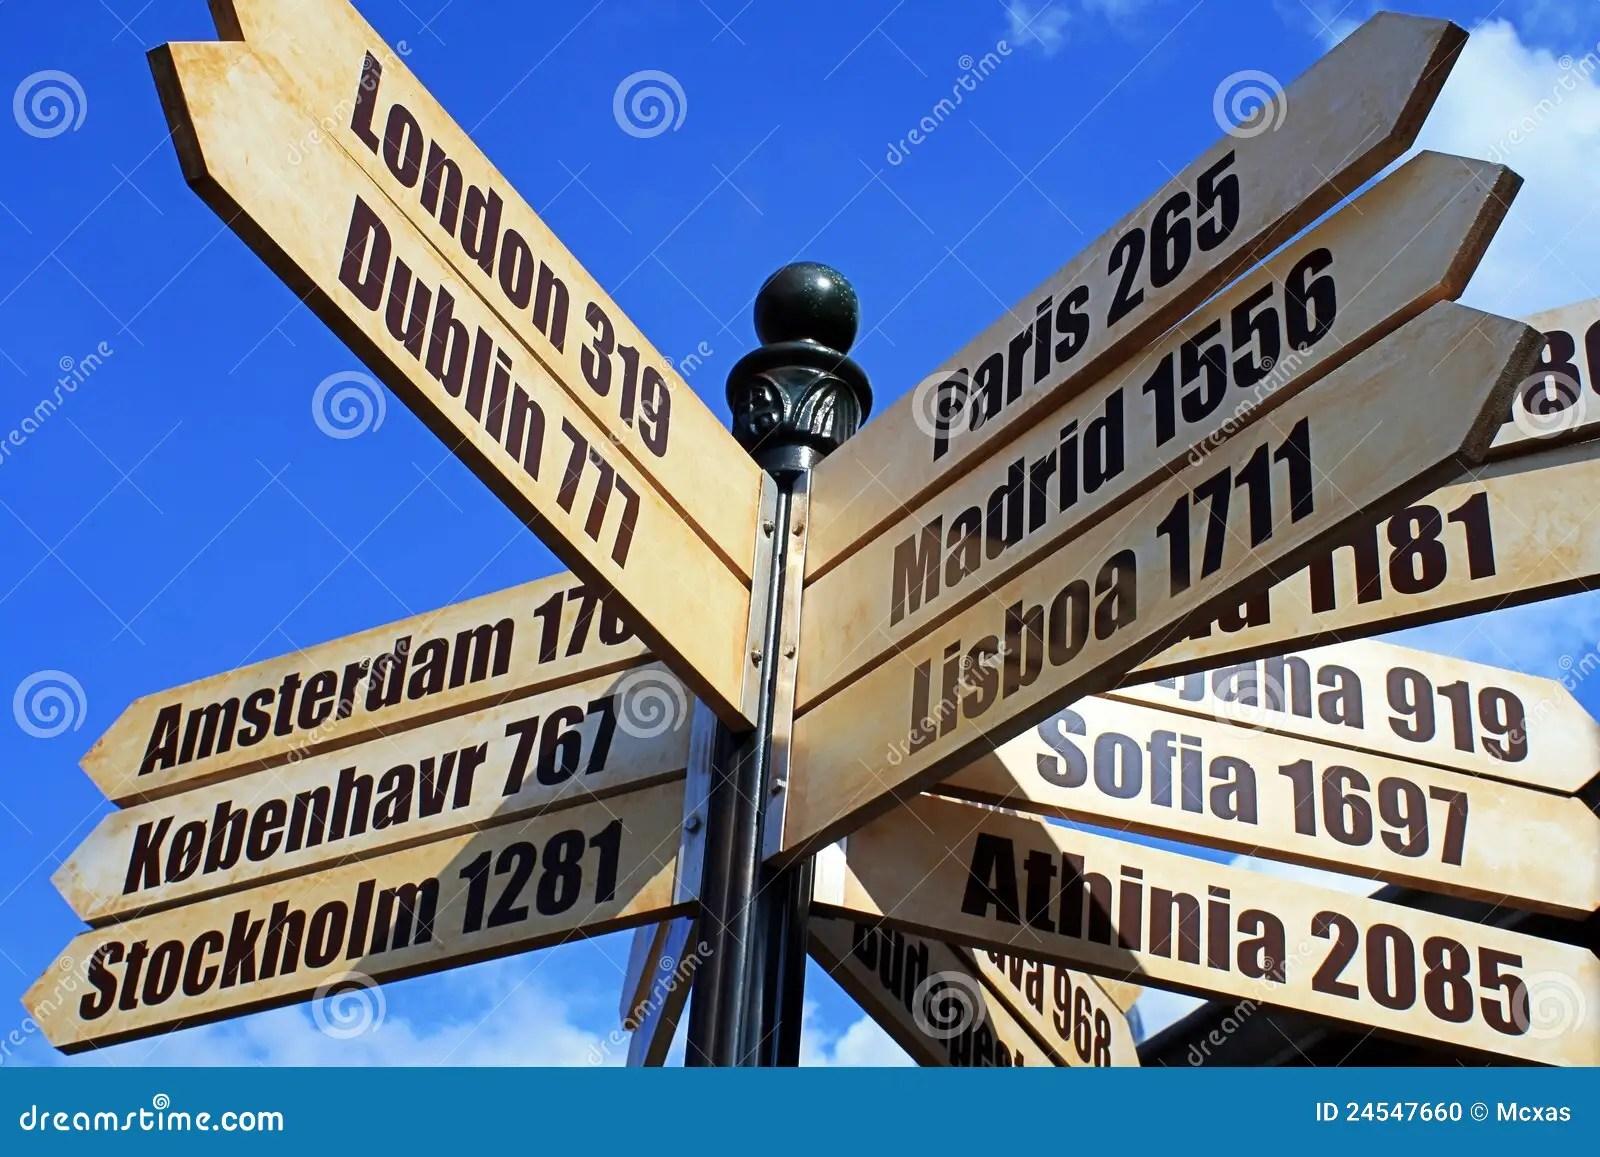 European Cities Distance Travel Sign Stock Photo